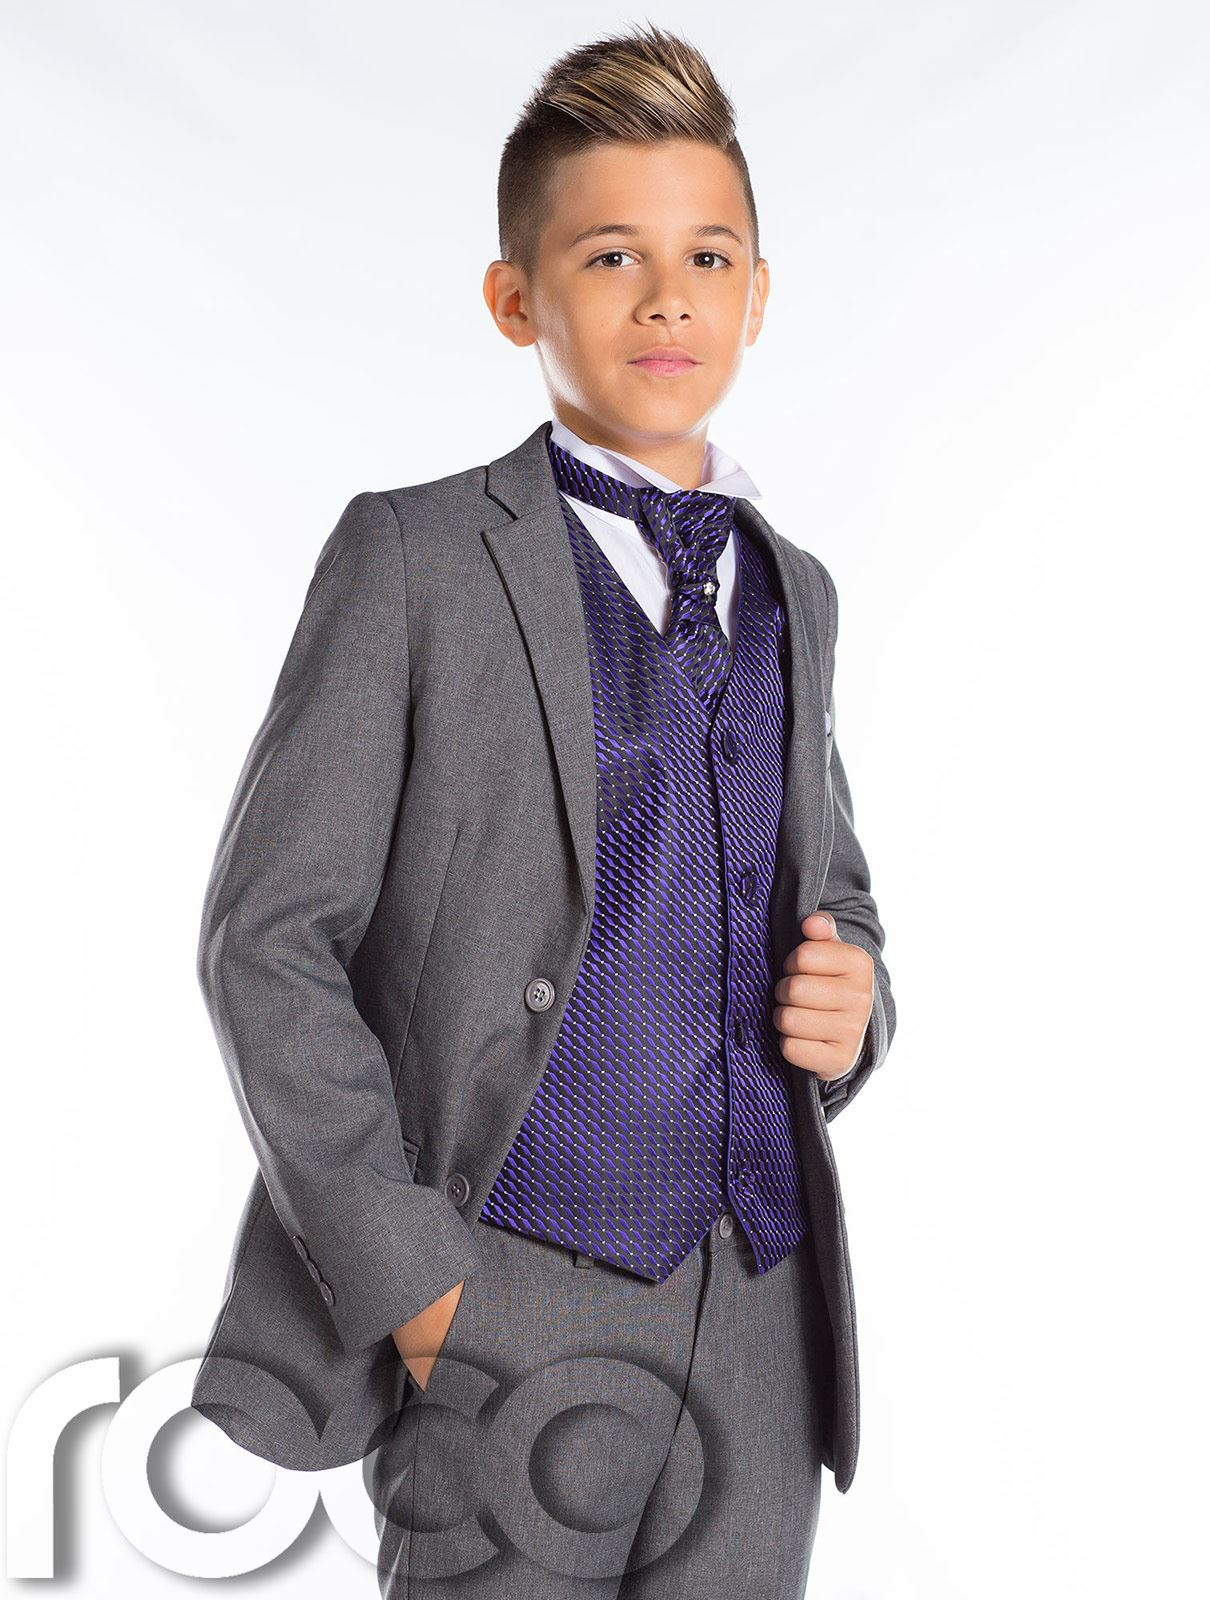 Boys Grey Suit, Boys Slim Fit Suit, Boys Prom Suit, Boys Wedding ...